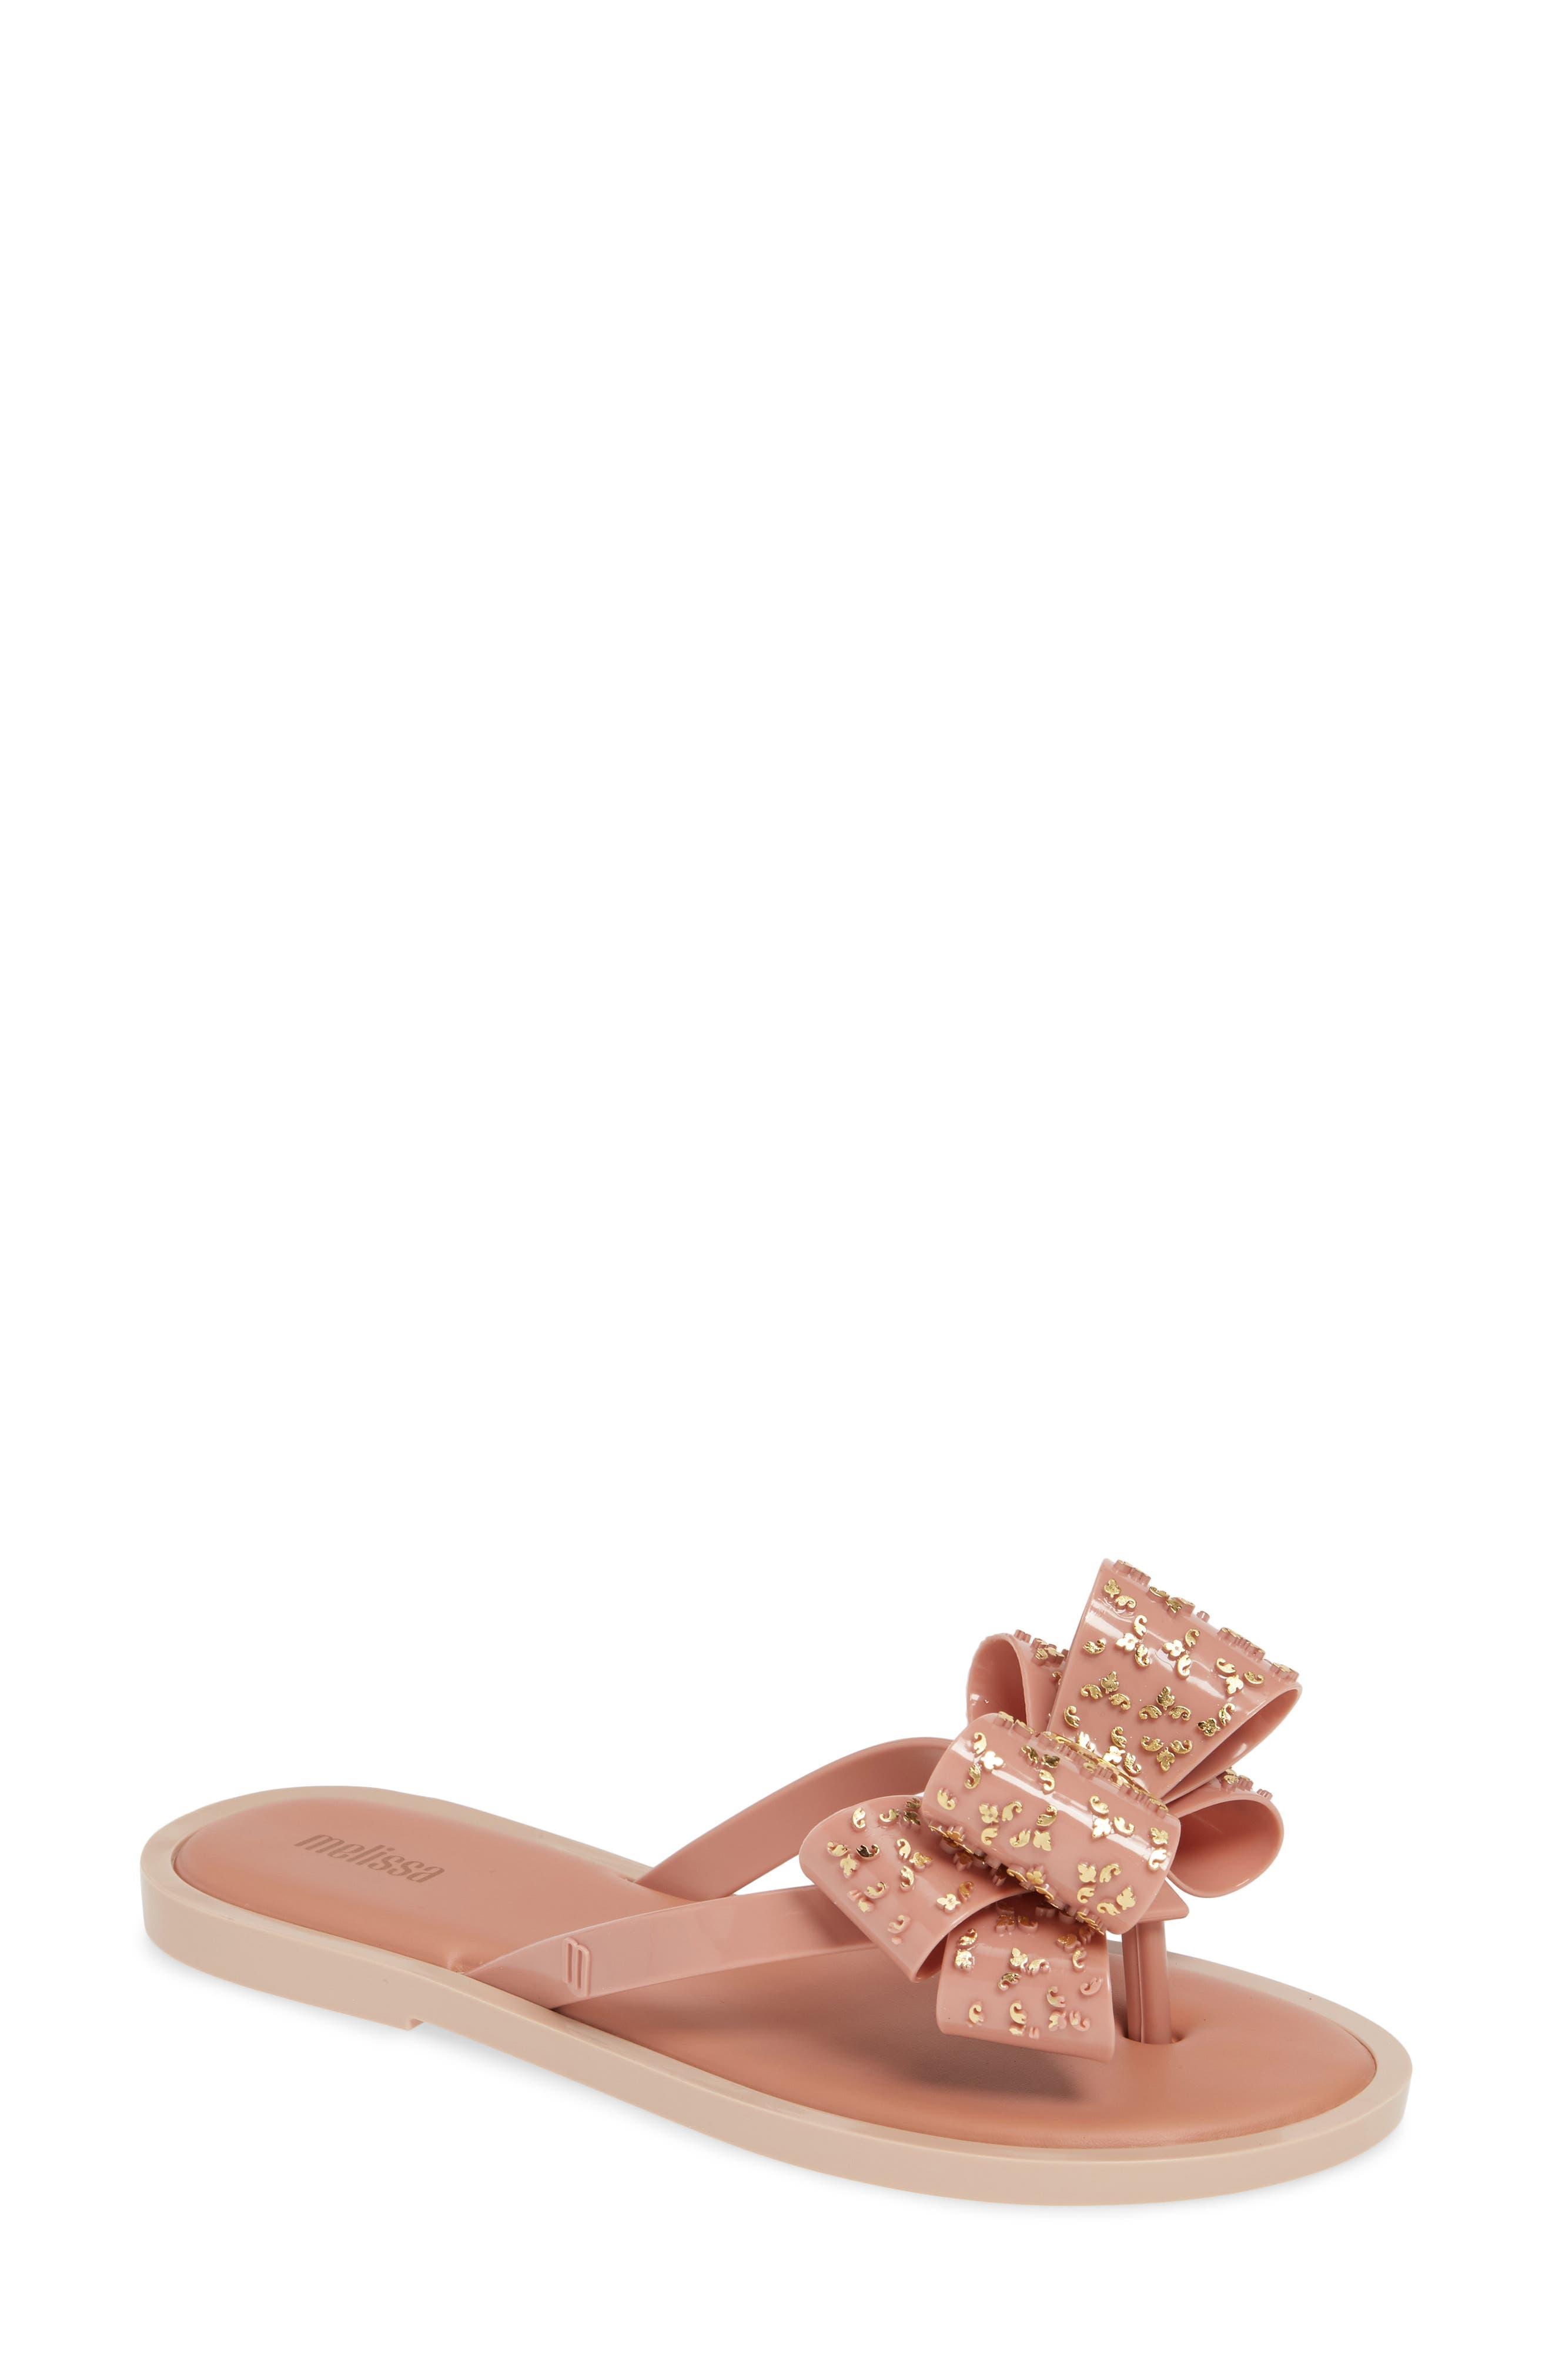 Melissa Sweet Flip Flop, Pink